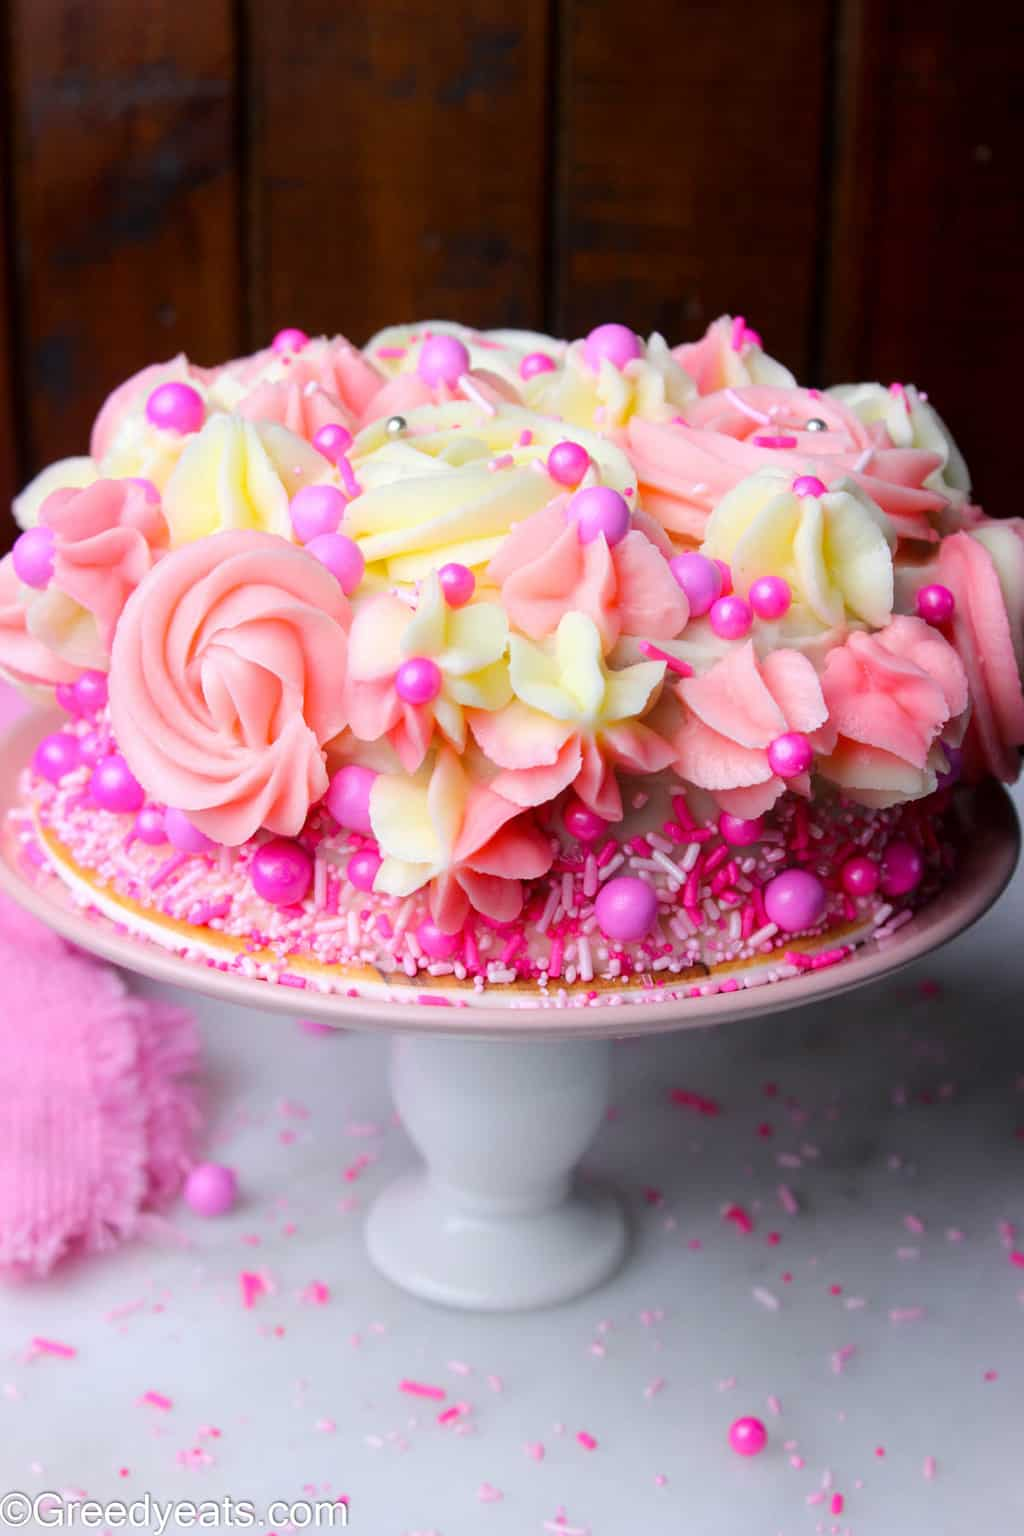 Single layer 6 inch vanilla cake recipe with easy vanilla buttercream frosting.